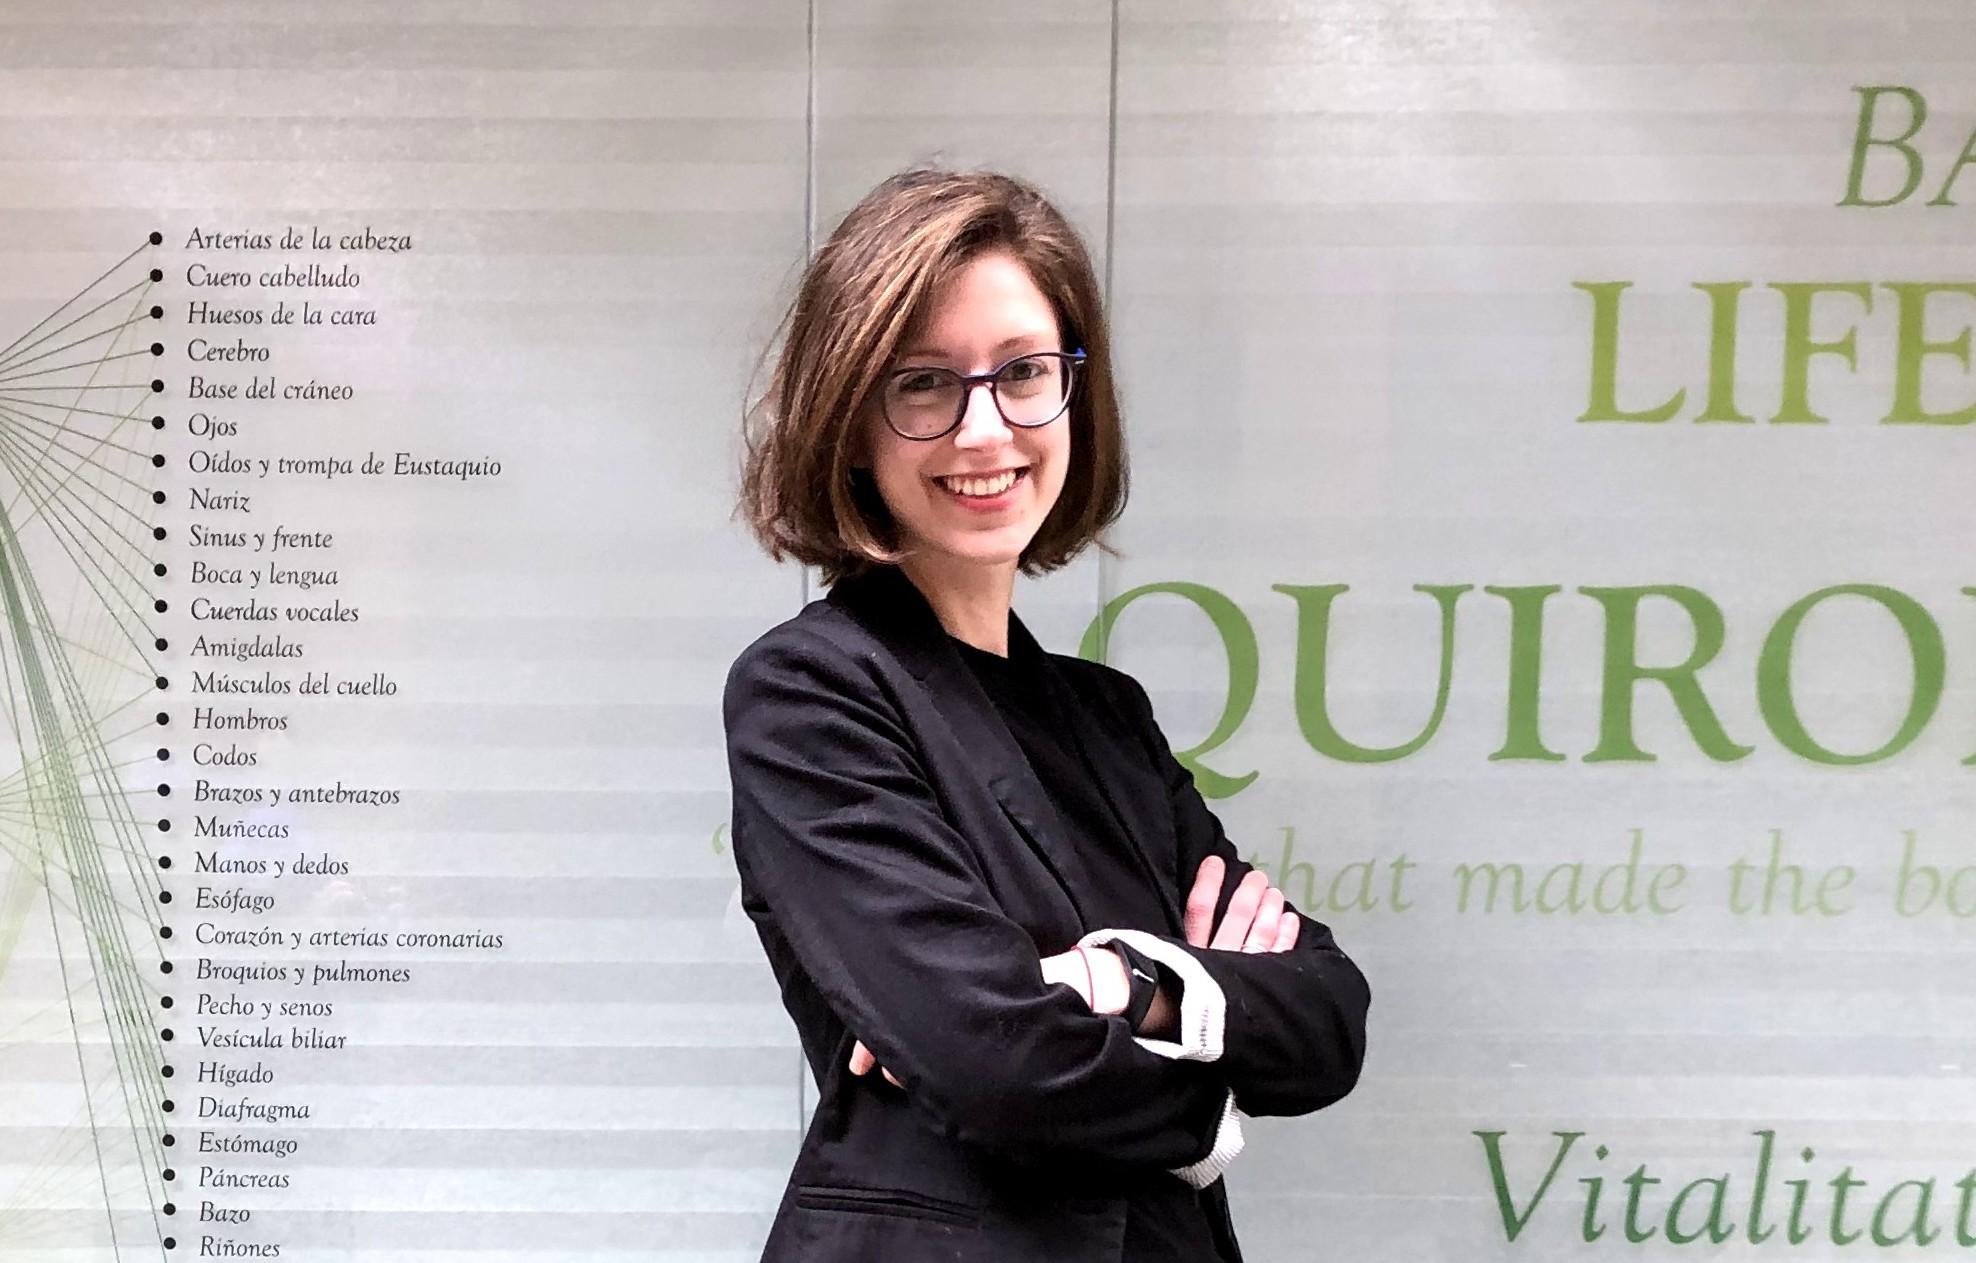 barbara-coaching-personal-empresarial-detienda-quiropractic-barcelona-olivera